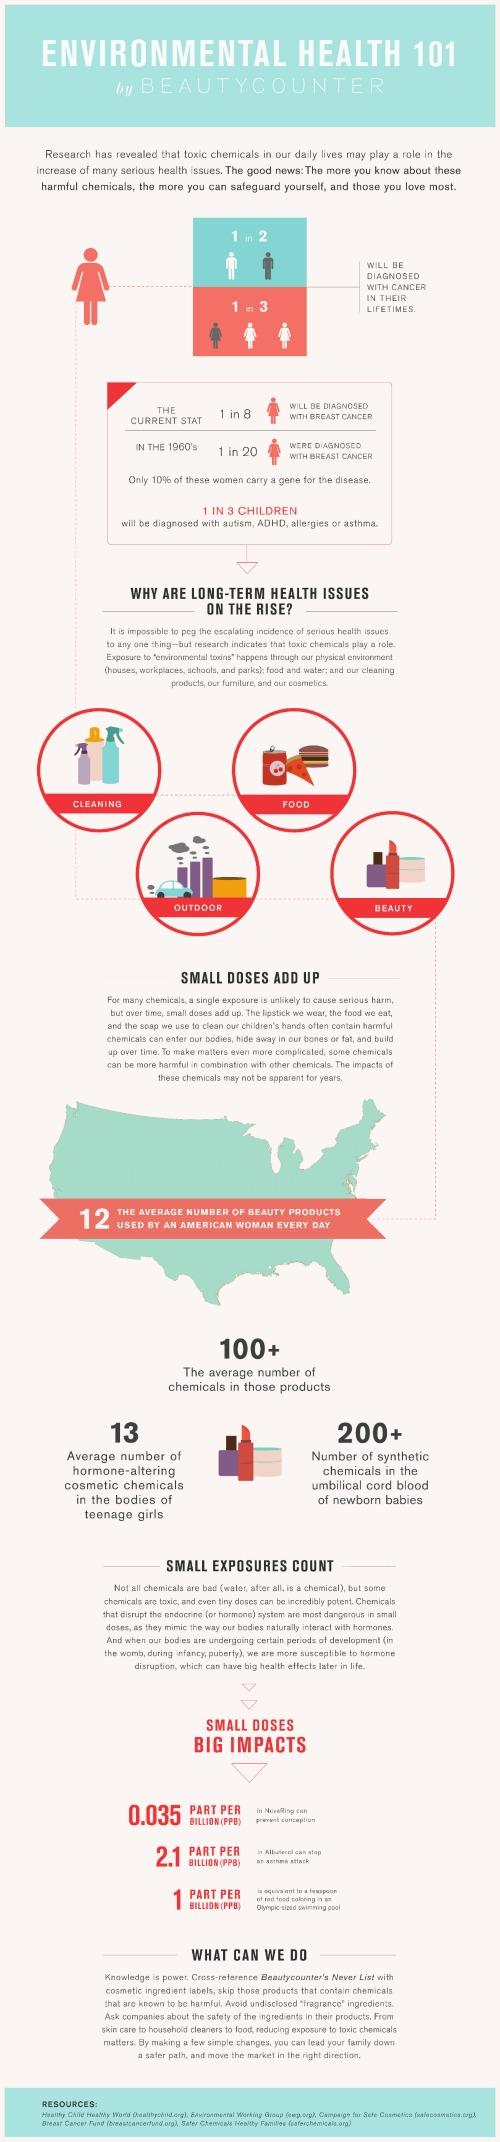 beautycounter_infographic_environmentalhealth101-1RESIZE.jpg